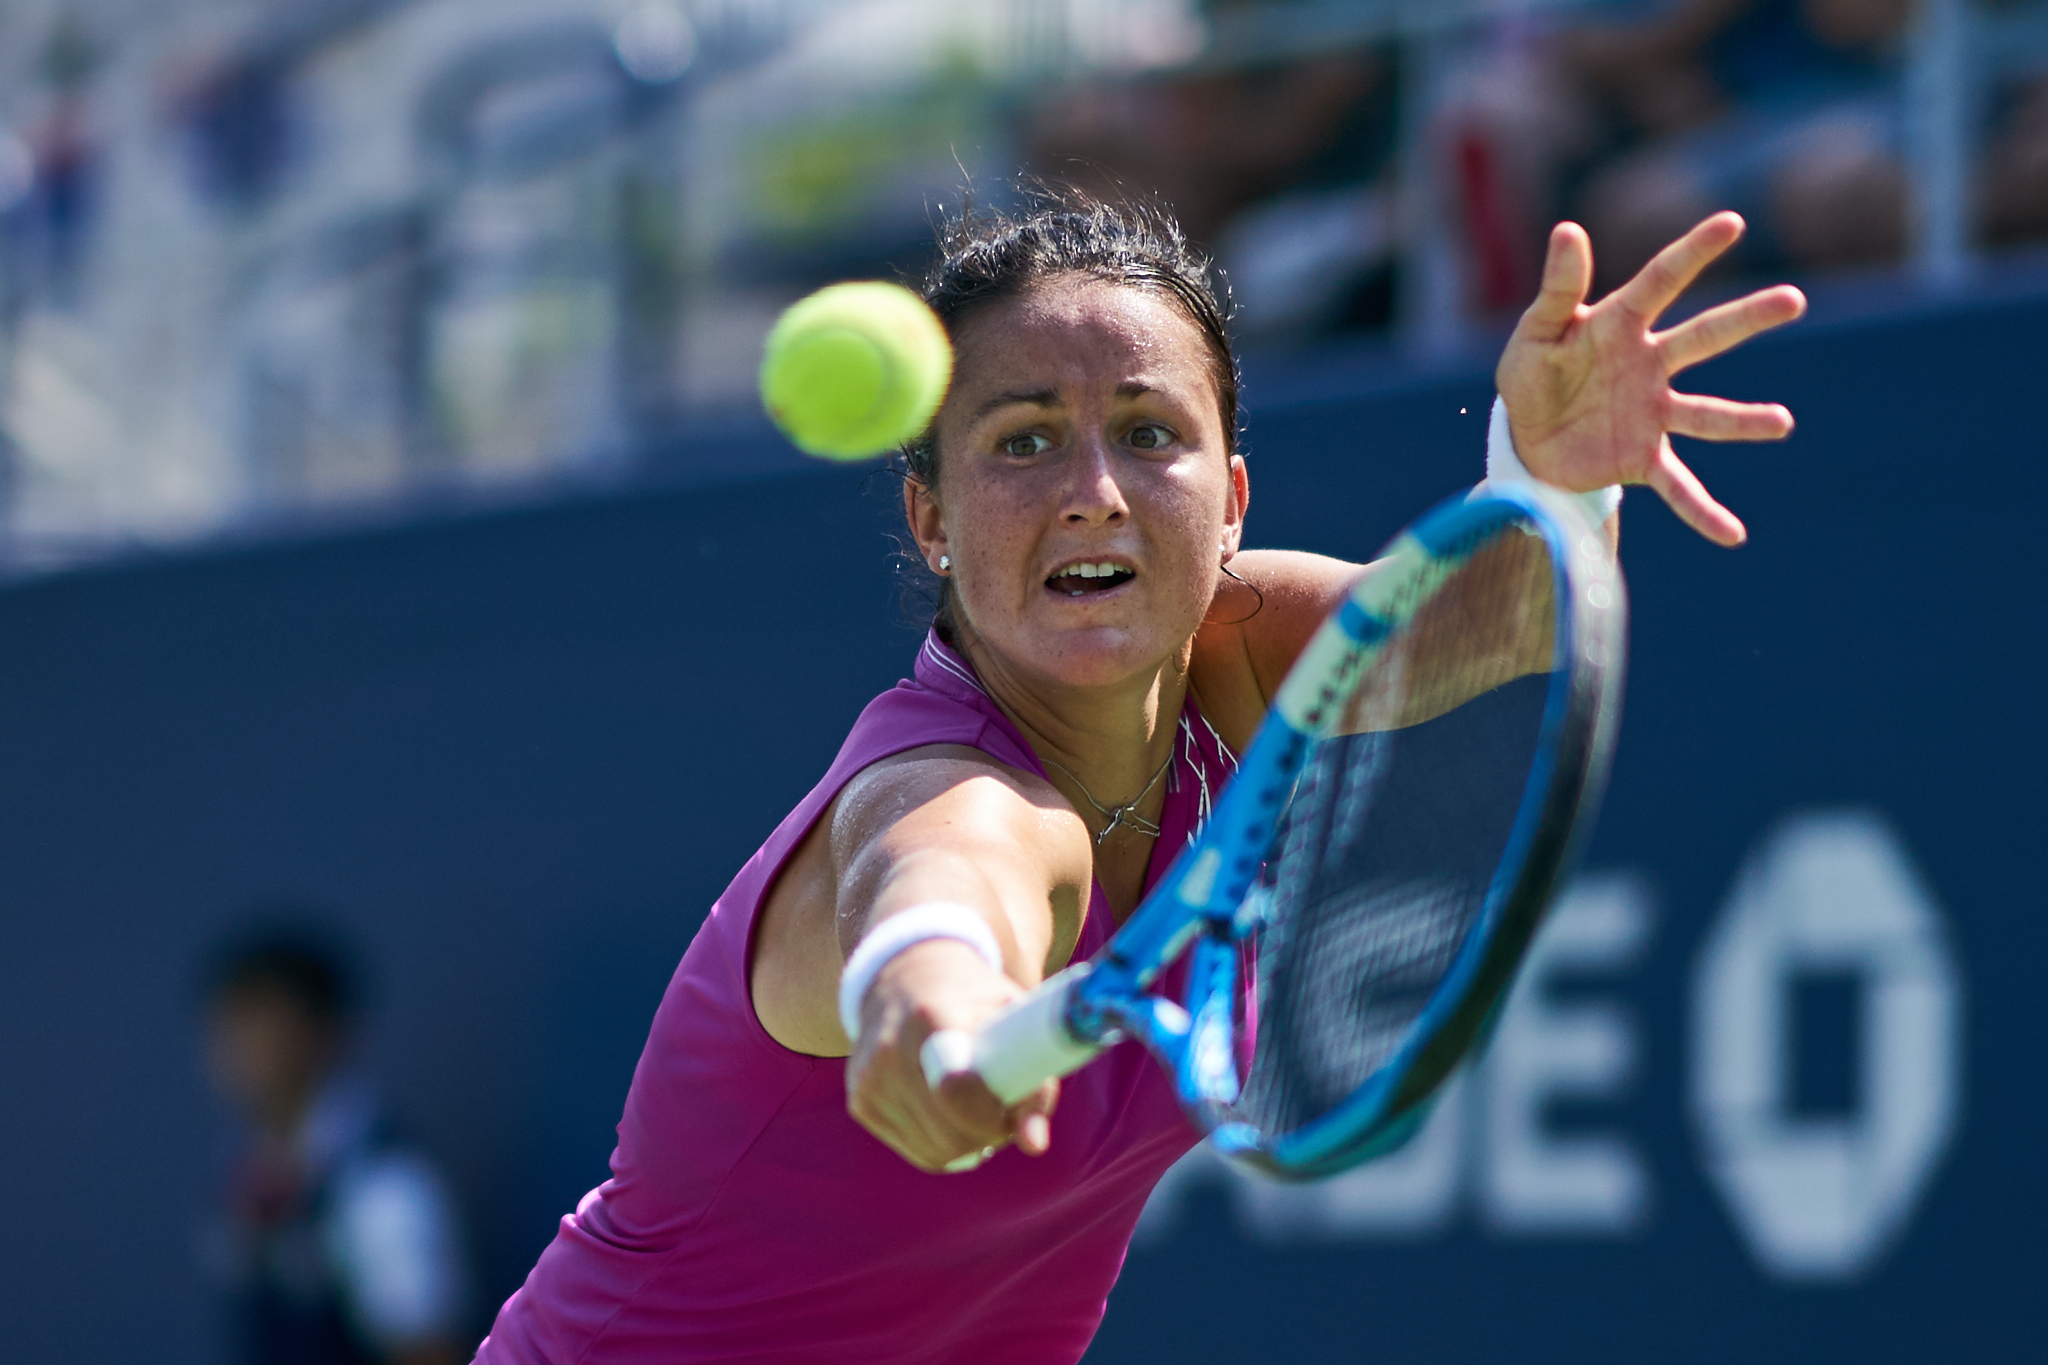 Lara Arruabarrena, Court 5, 2nd round Women's Singles  Sony A9, Sony 85mm f1.4 GM